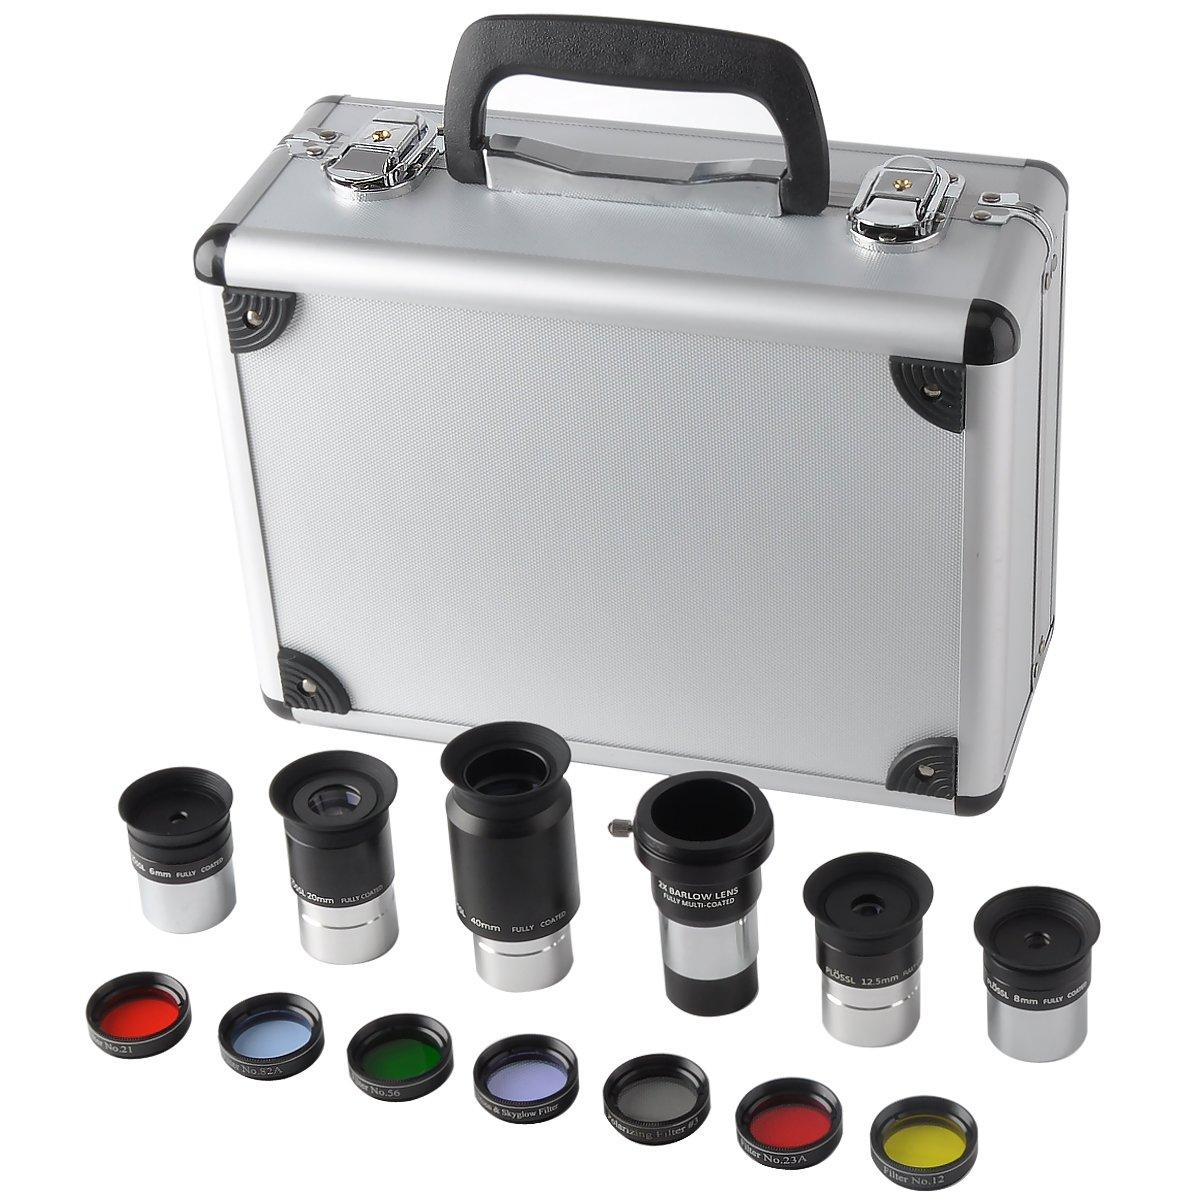 Gosky 1.25-Inch Premium Telescope Accessory Kit (Silver)- 5pcs Plossl Eyepiece Set, 7pcs Filter Set, 2X Barlow Lens by Gosky